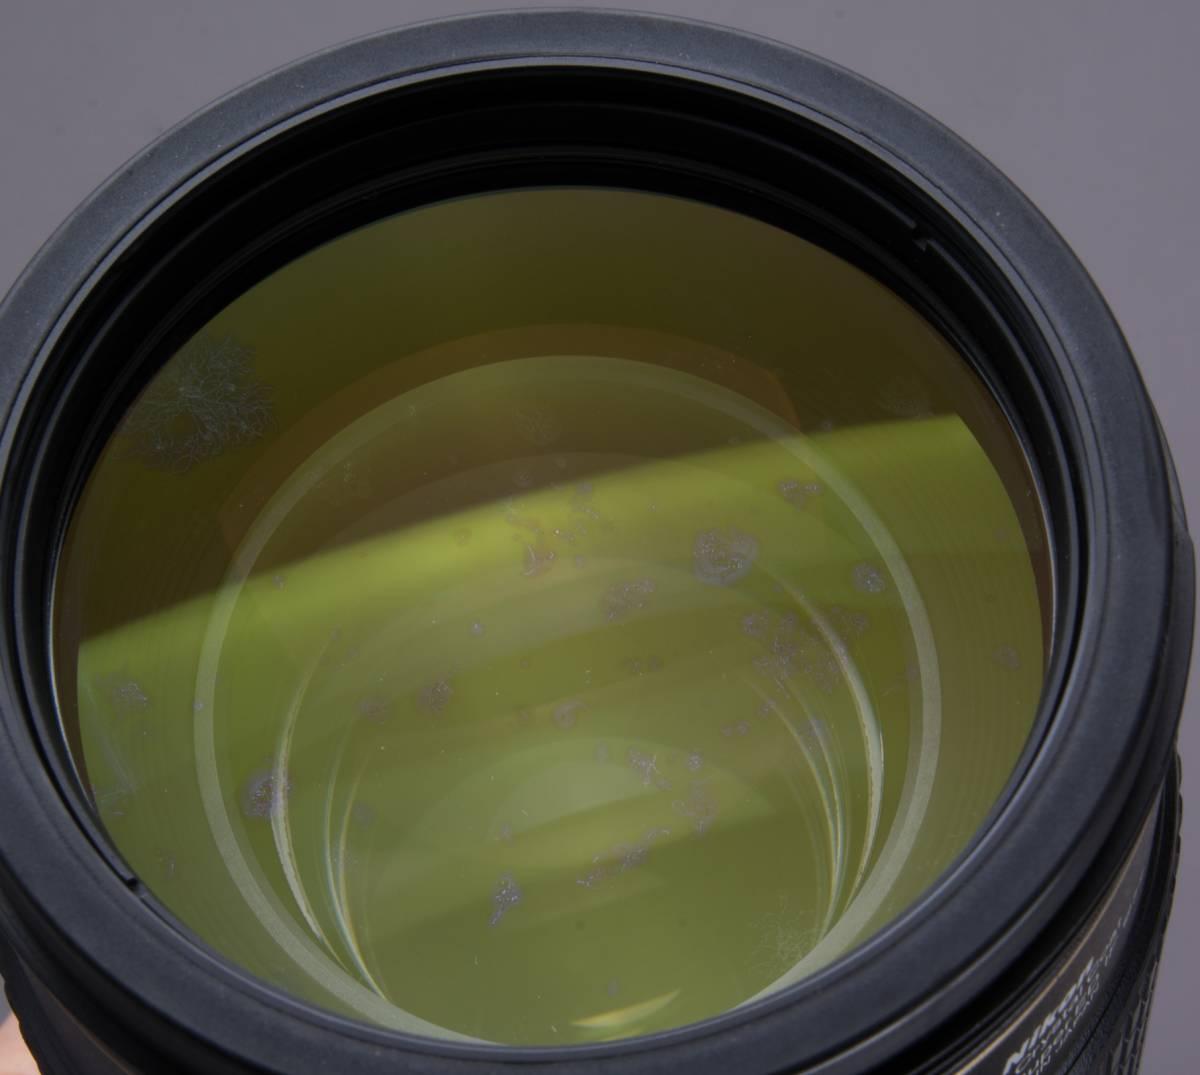 Nikon AF-S NIKKOR 80-400mm f/4.5-5.6G ED VR フード・プロテクター・ケース付 望遠ズームレンズ ニコン 撮影機材 一眼レフ カメラ_画像8